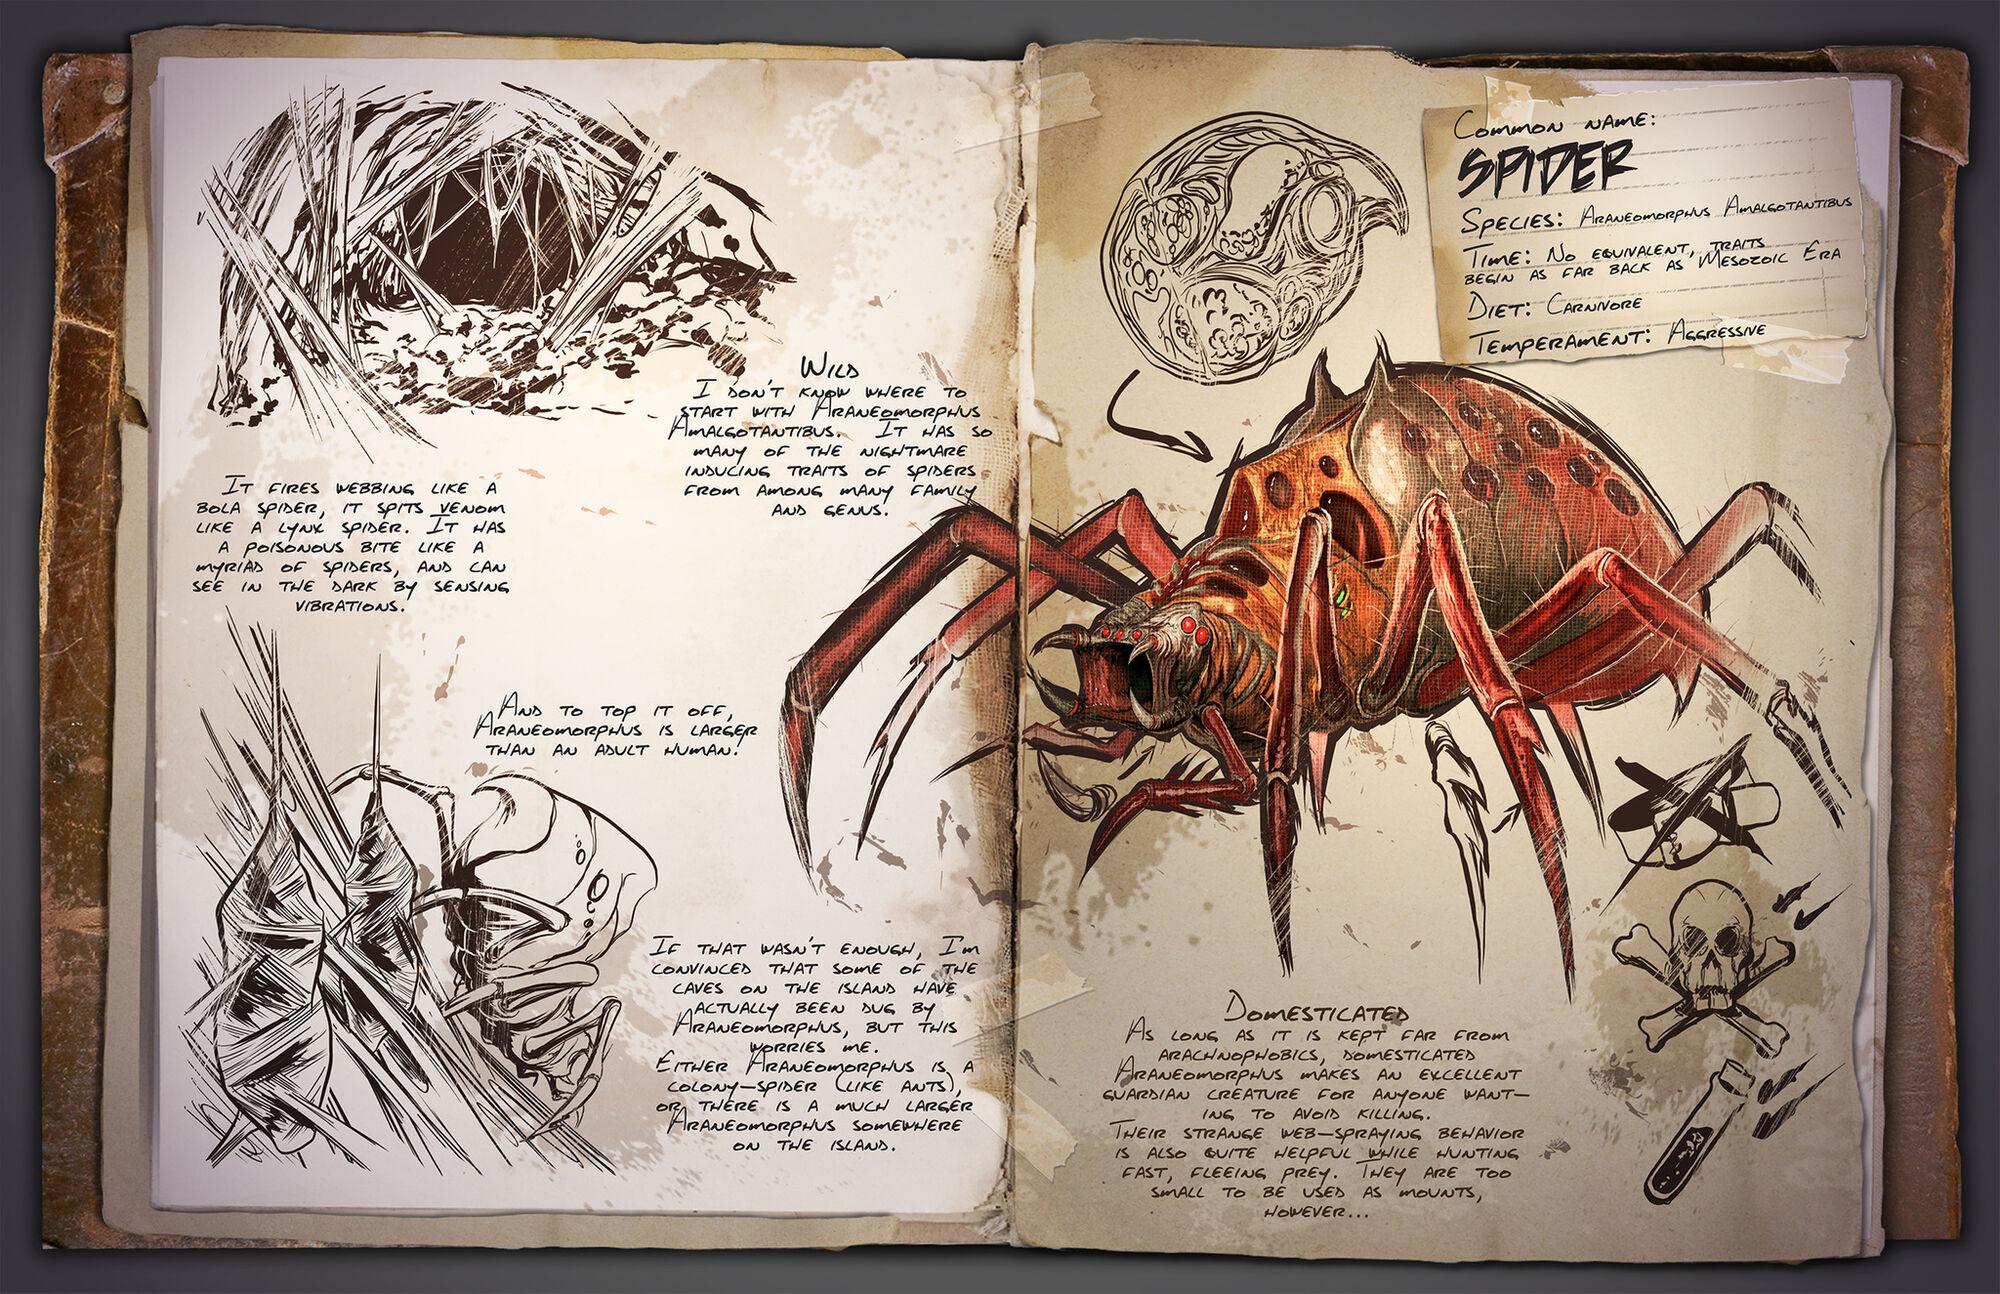 Araneomorphus | ARK: Survival Evolved Wiki | FANDOM powered